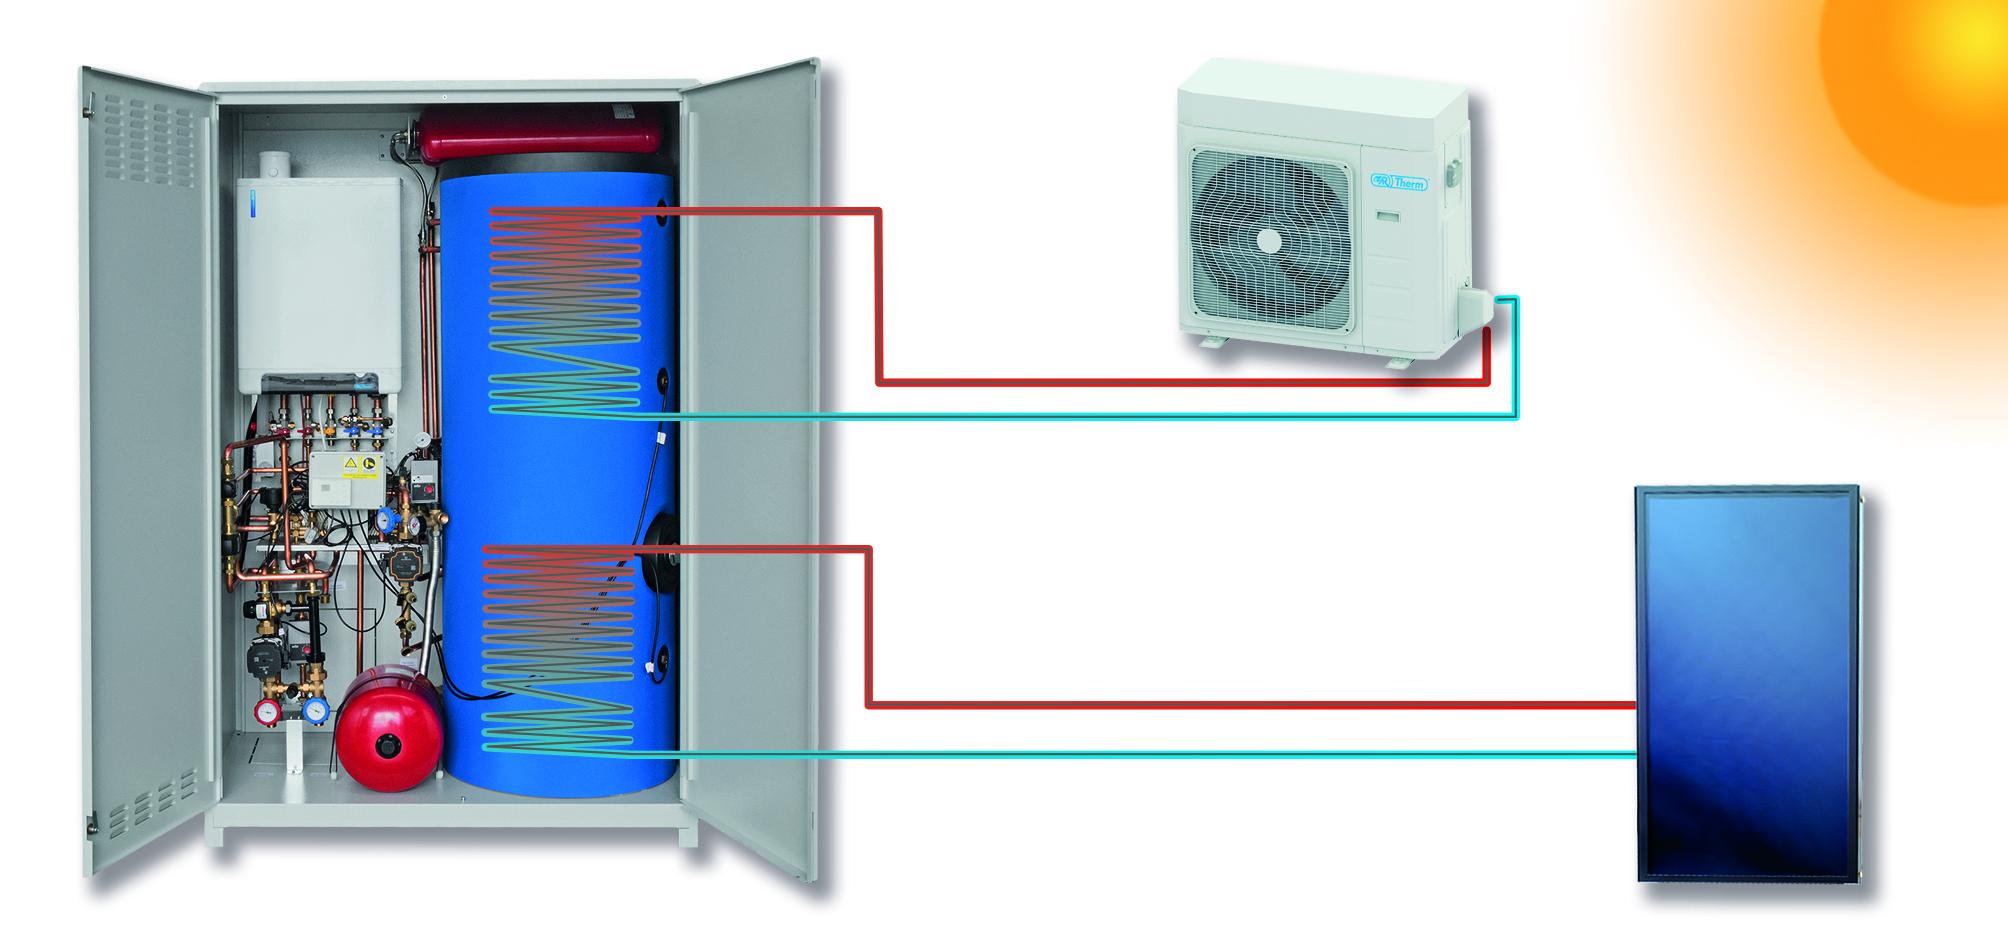 Sistema ibrido di riscaldamento